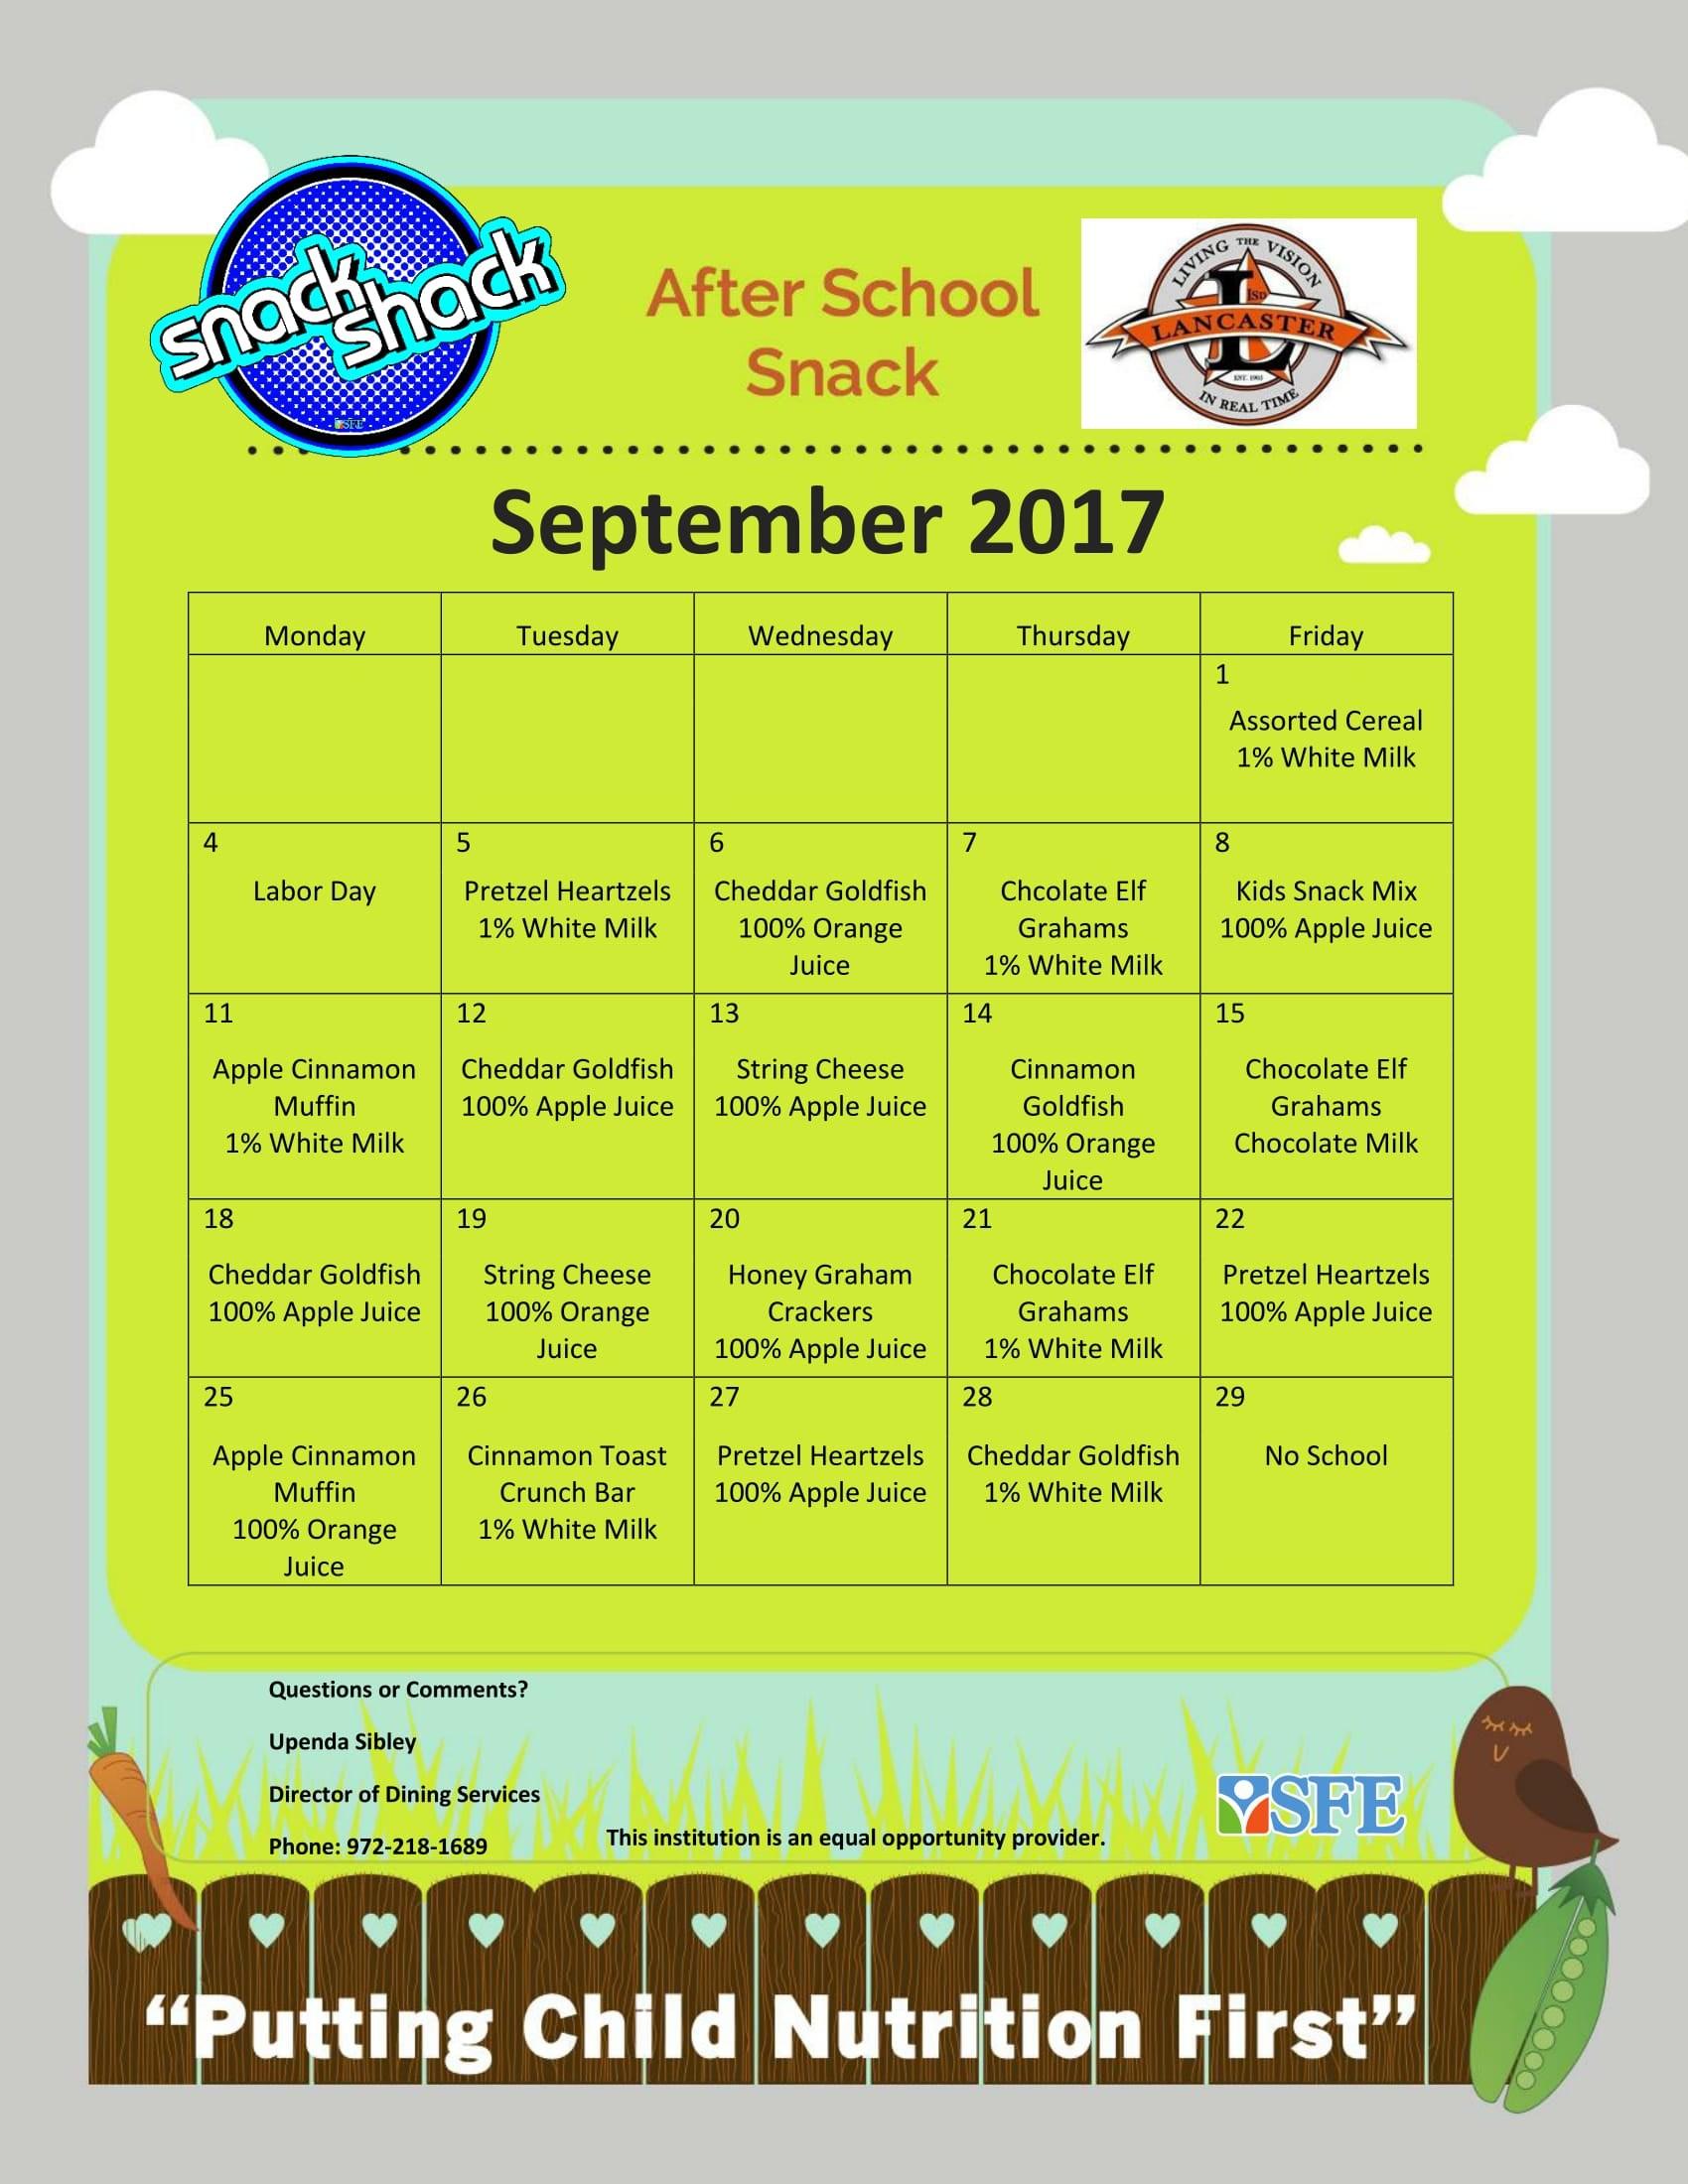 Image of September 2017 snack menu